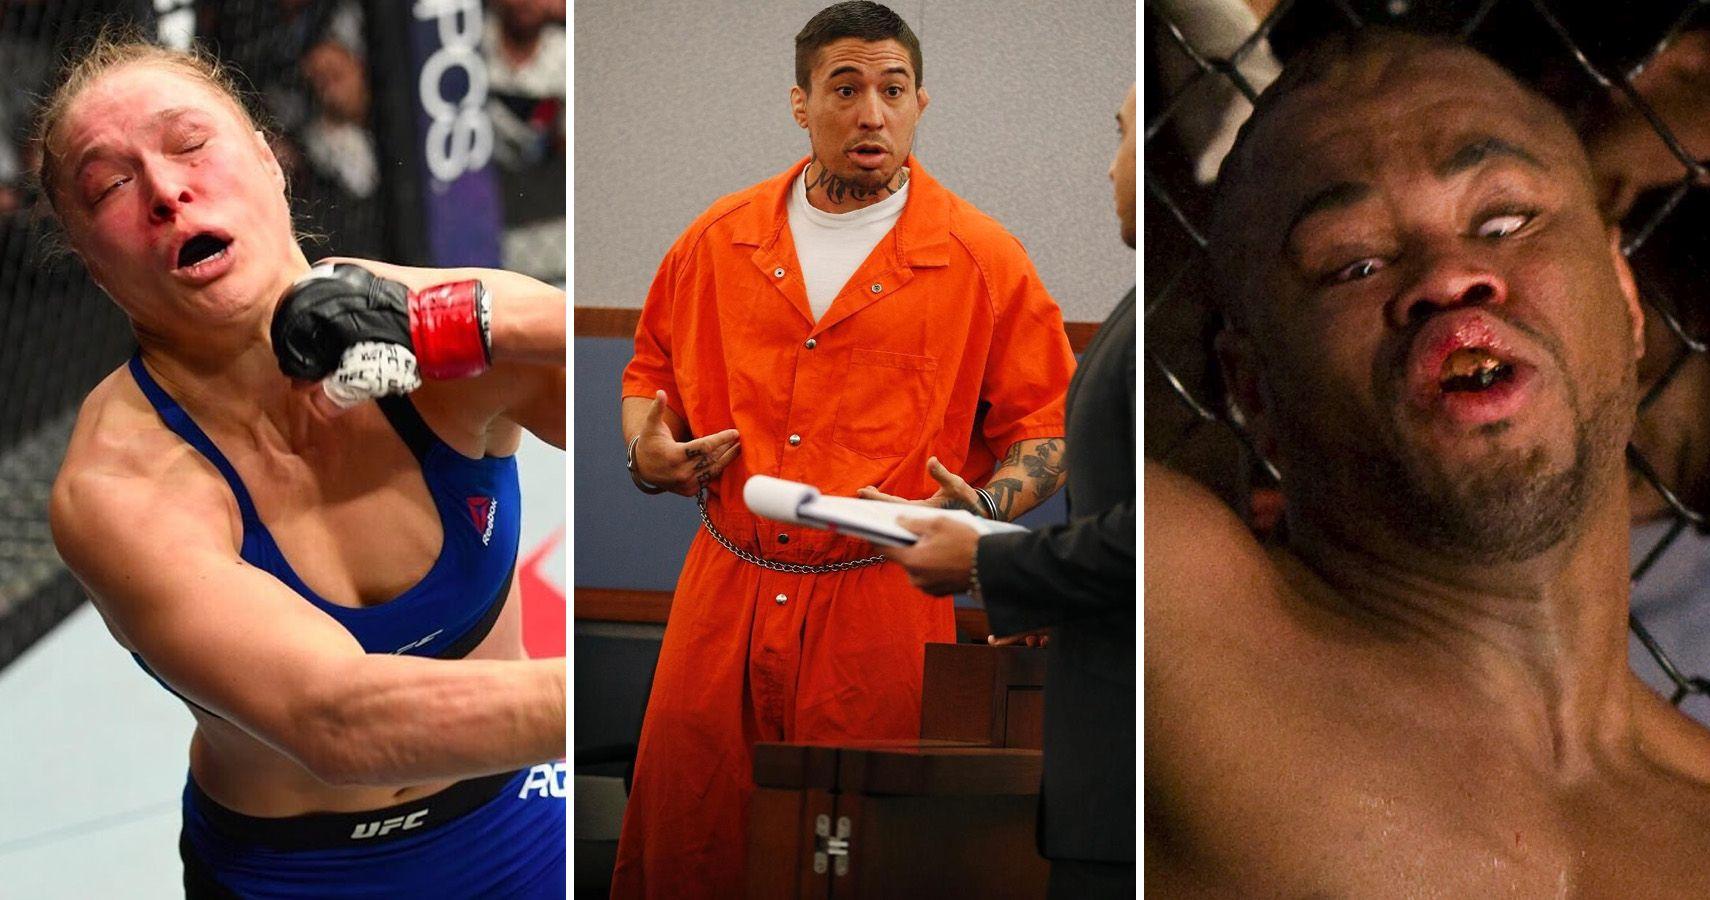 Top 20 Most EMBARRASSING Pics Involving MMA Fighters